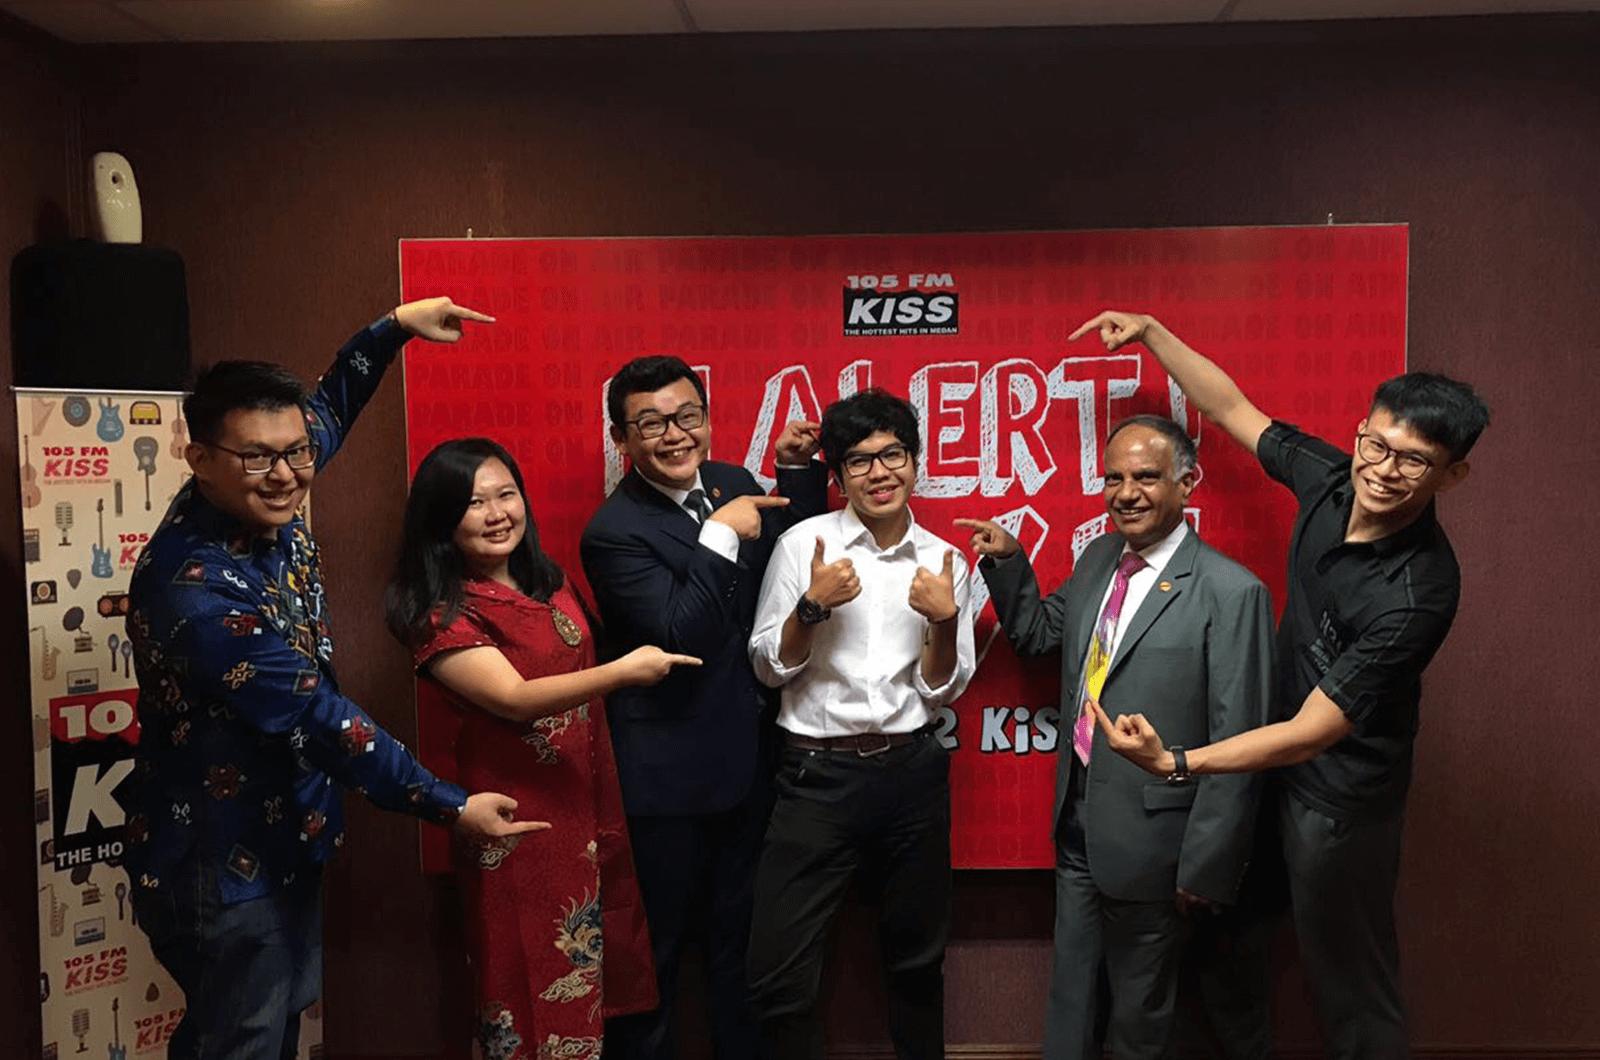 Deepak visits club members at a radio station Indonesia.